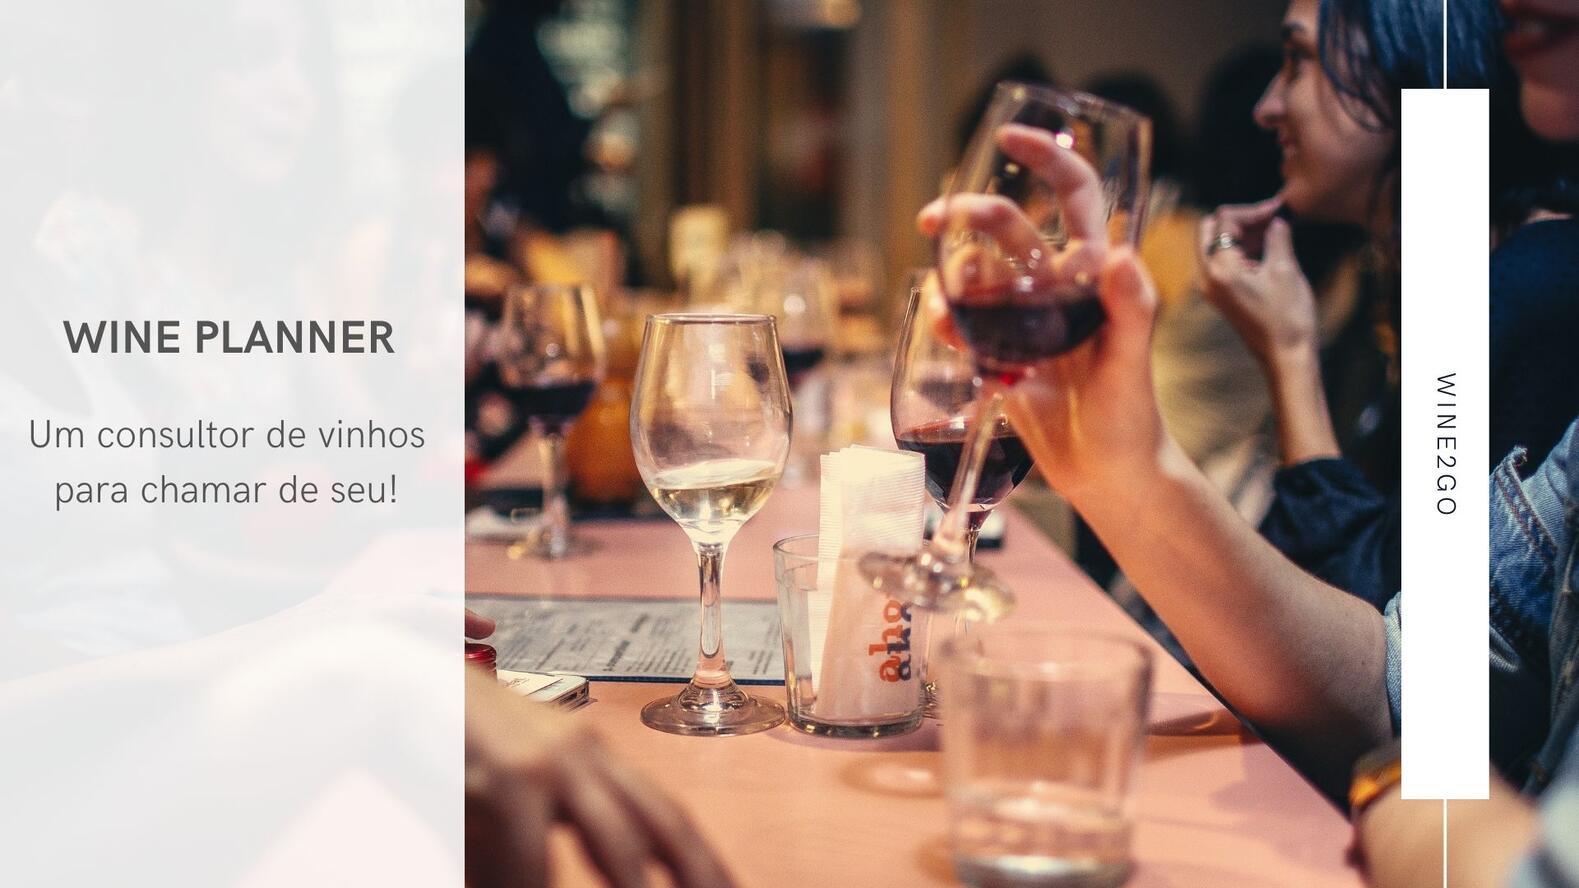 Wine Planner